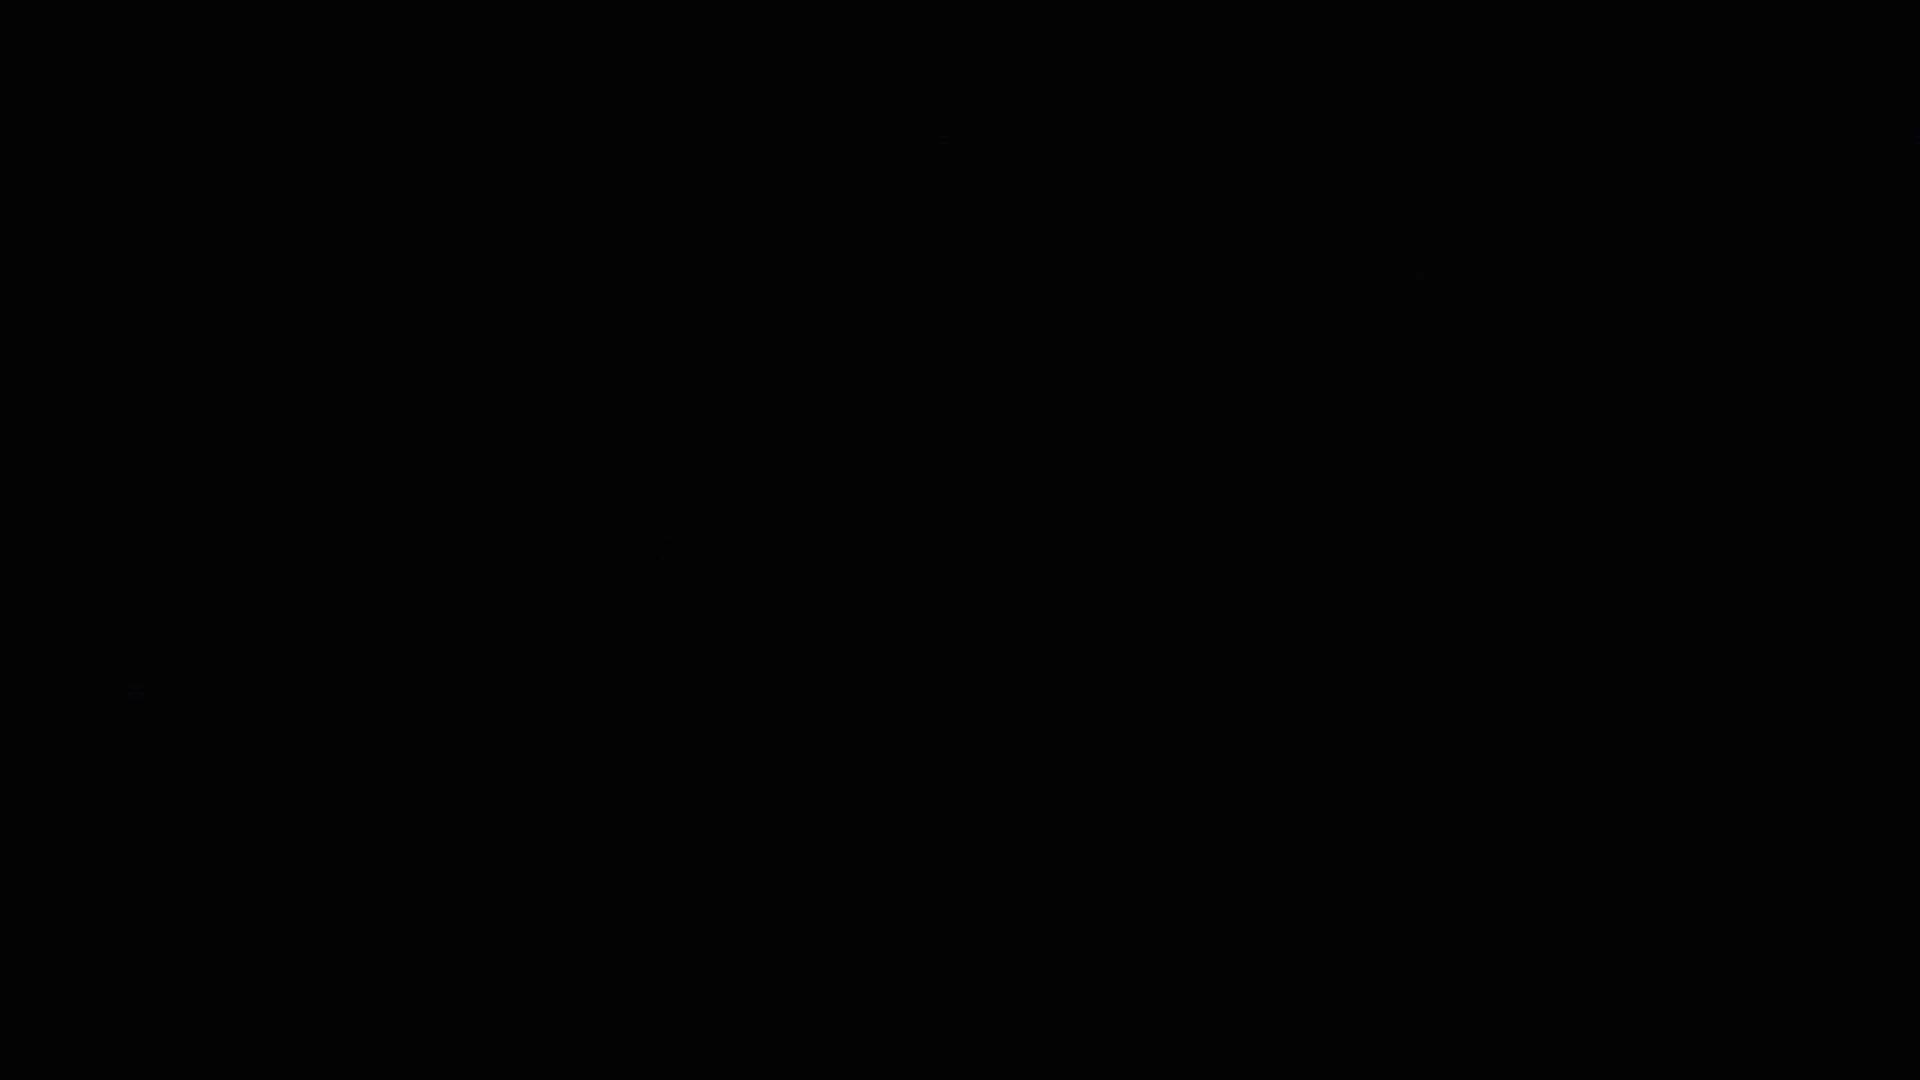 StarWarsLeaks, TLJ - Training - Reversed GIFs